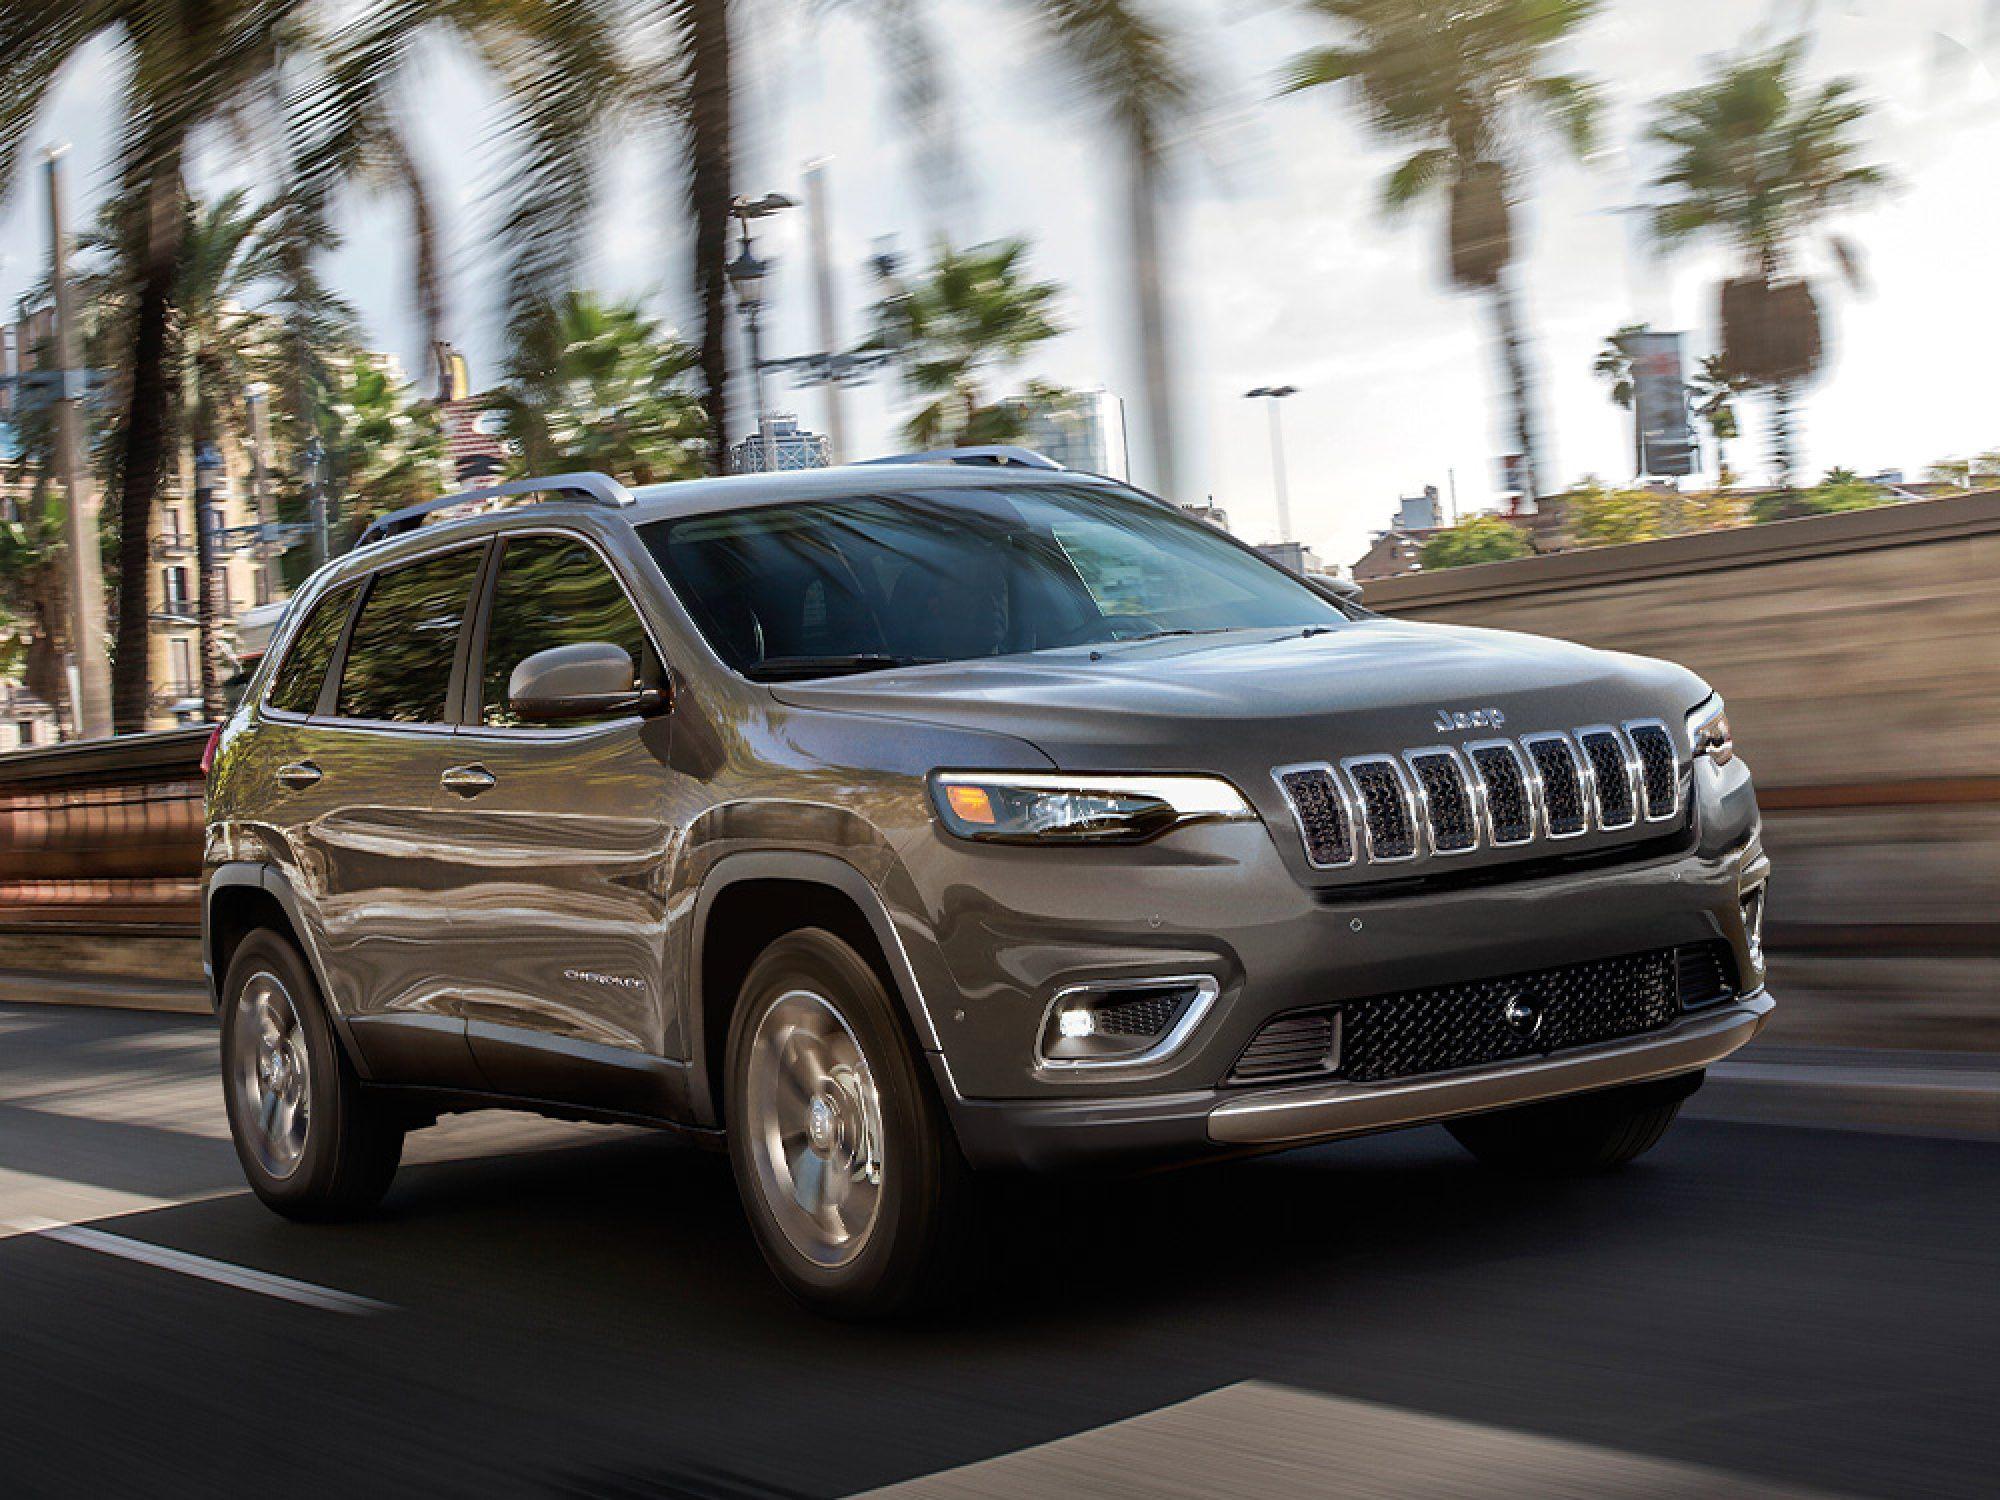 2020 Jeep Cherokee - Grey Exterior